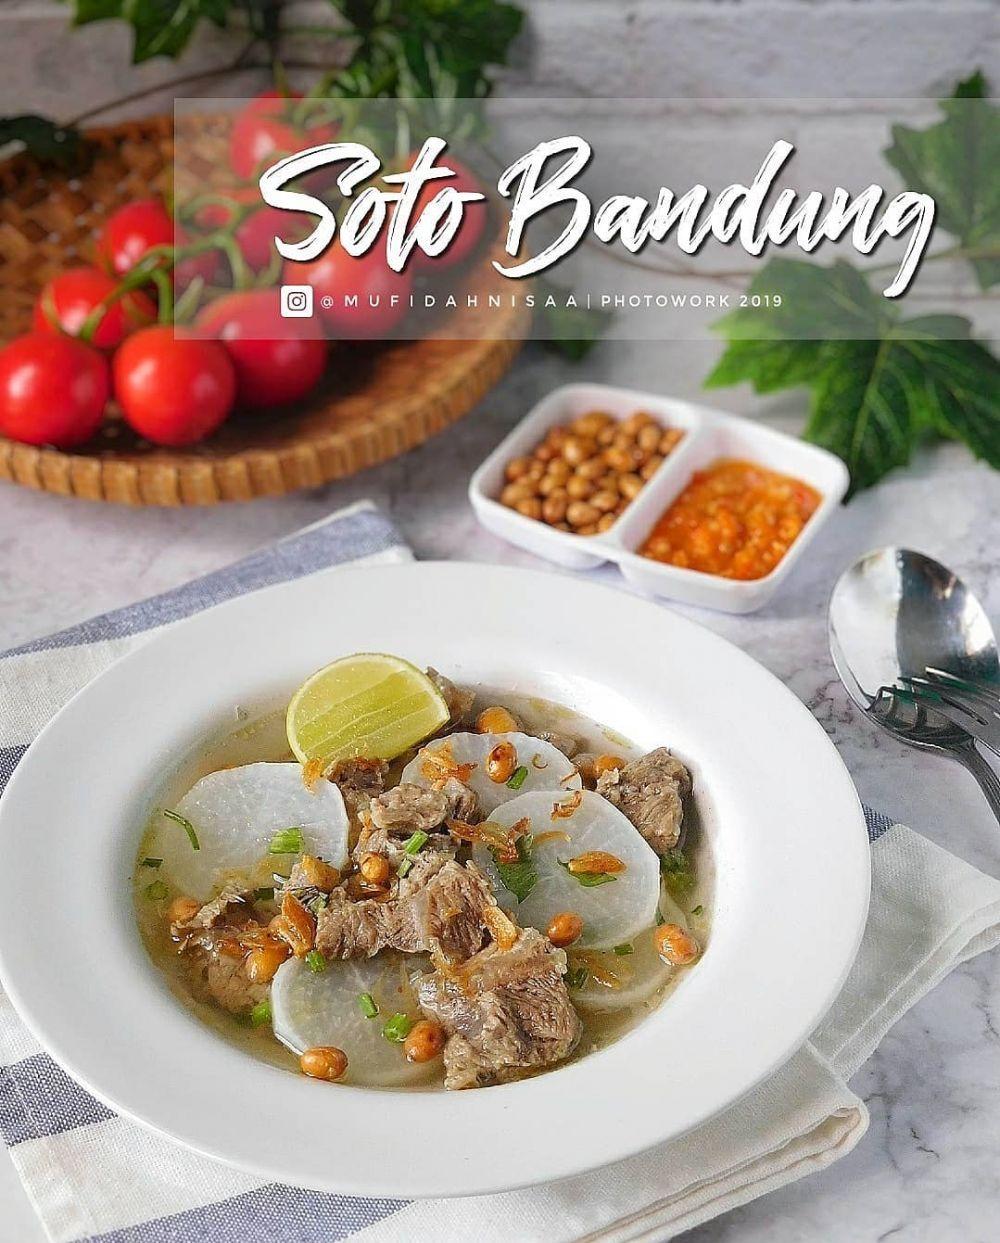 Resep Makanan Bandung Instagram Di 2020 Resep Makanan Makanan Resep Masakan